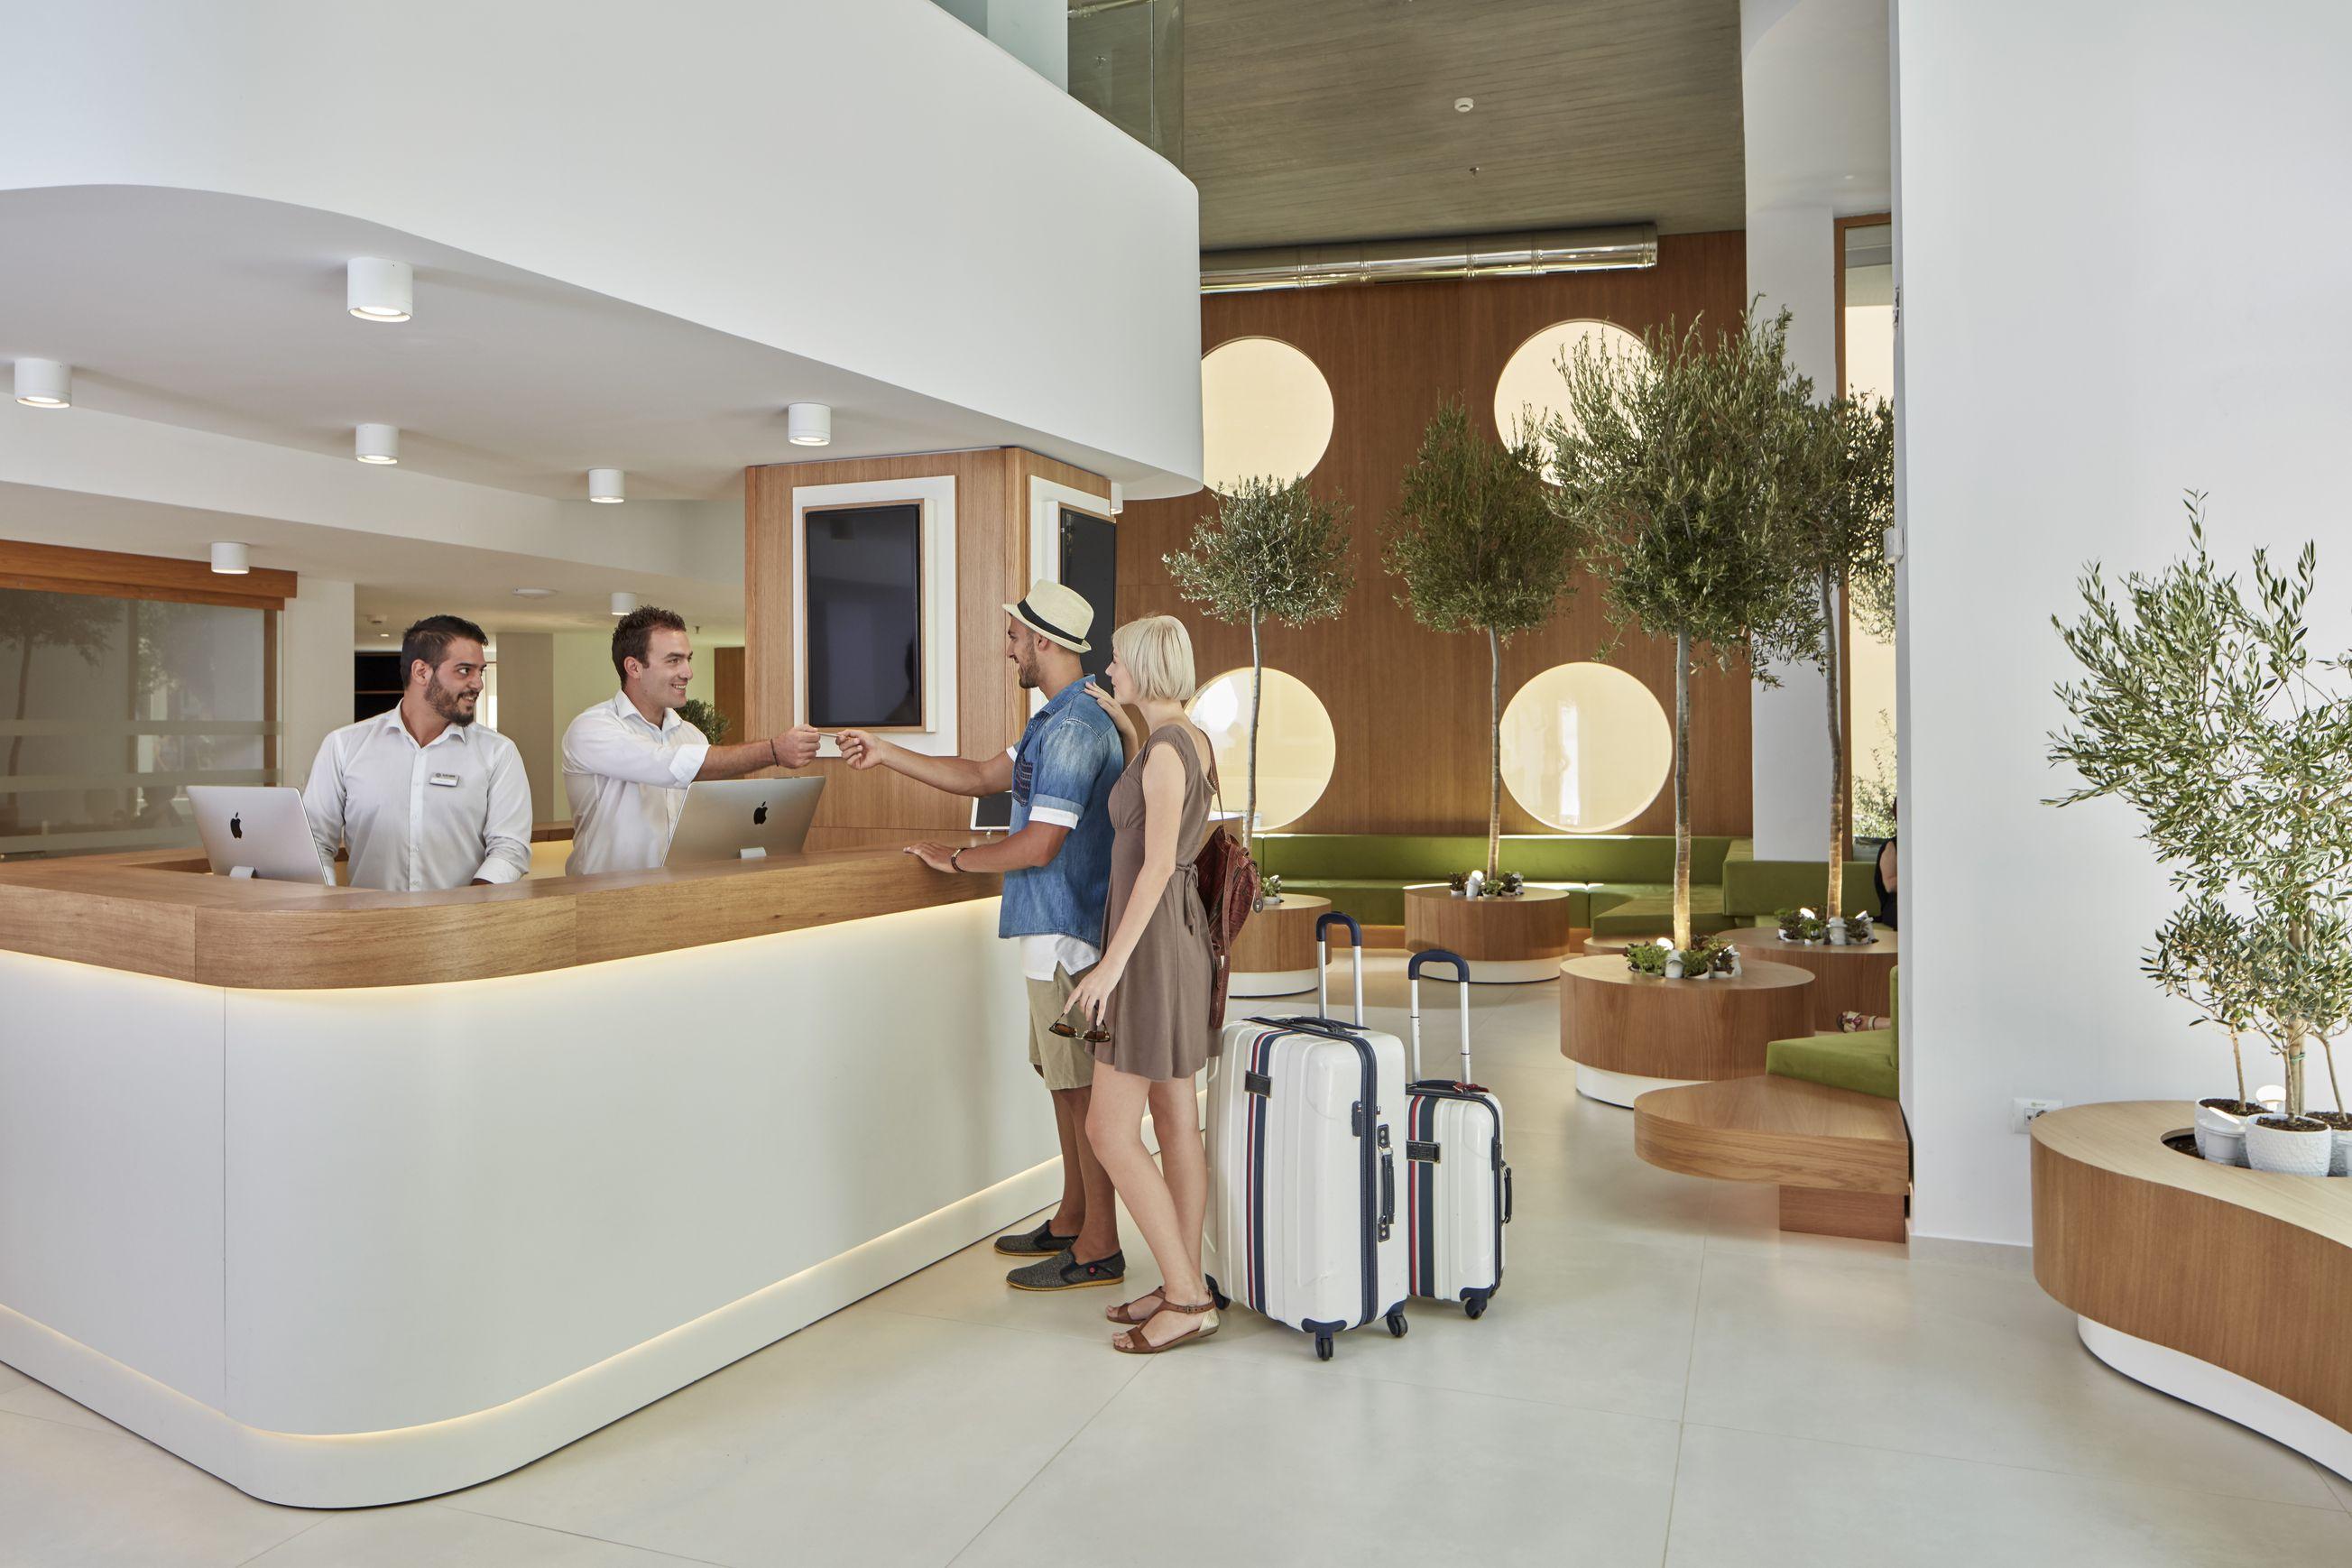 Olive Green hotel restaurant